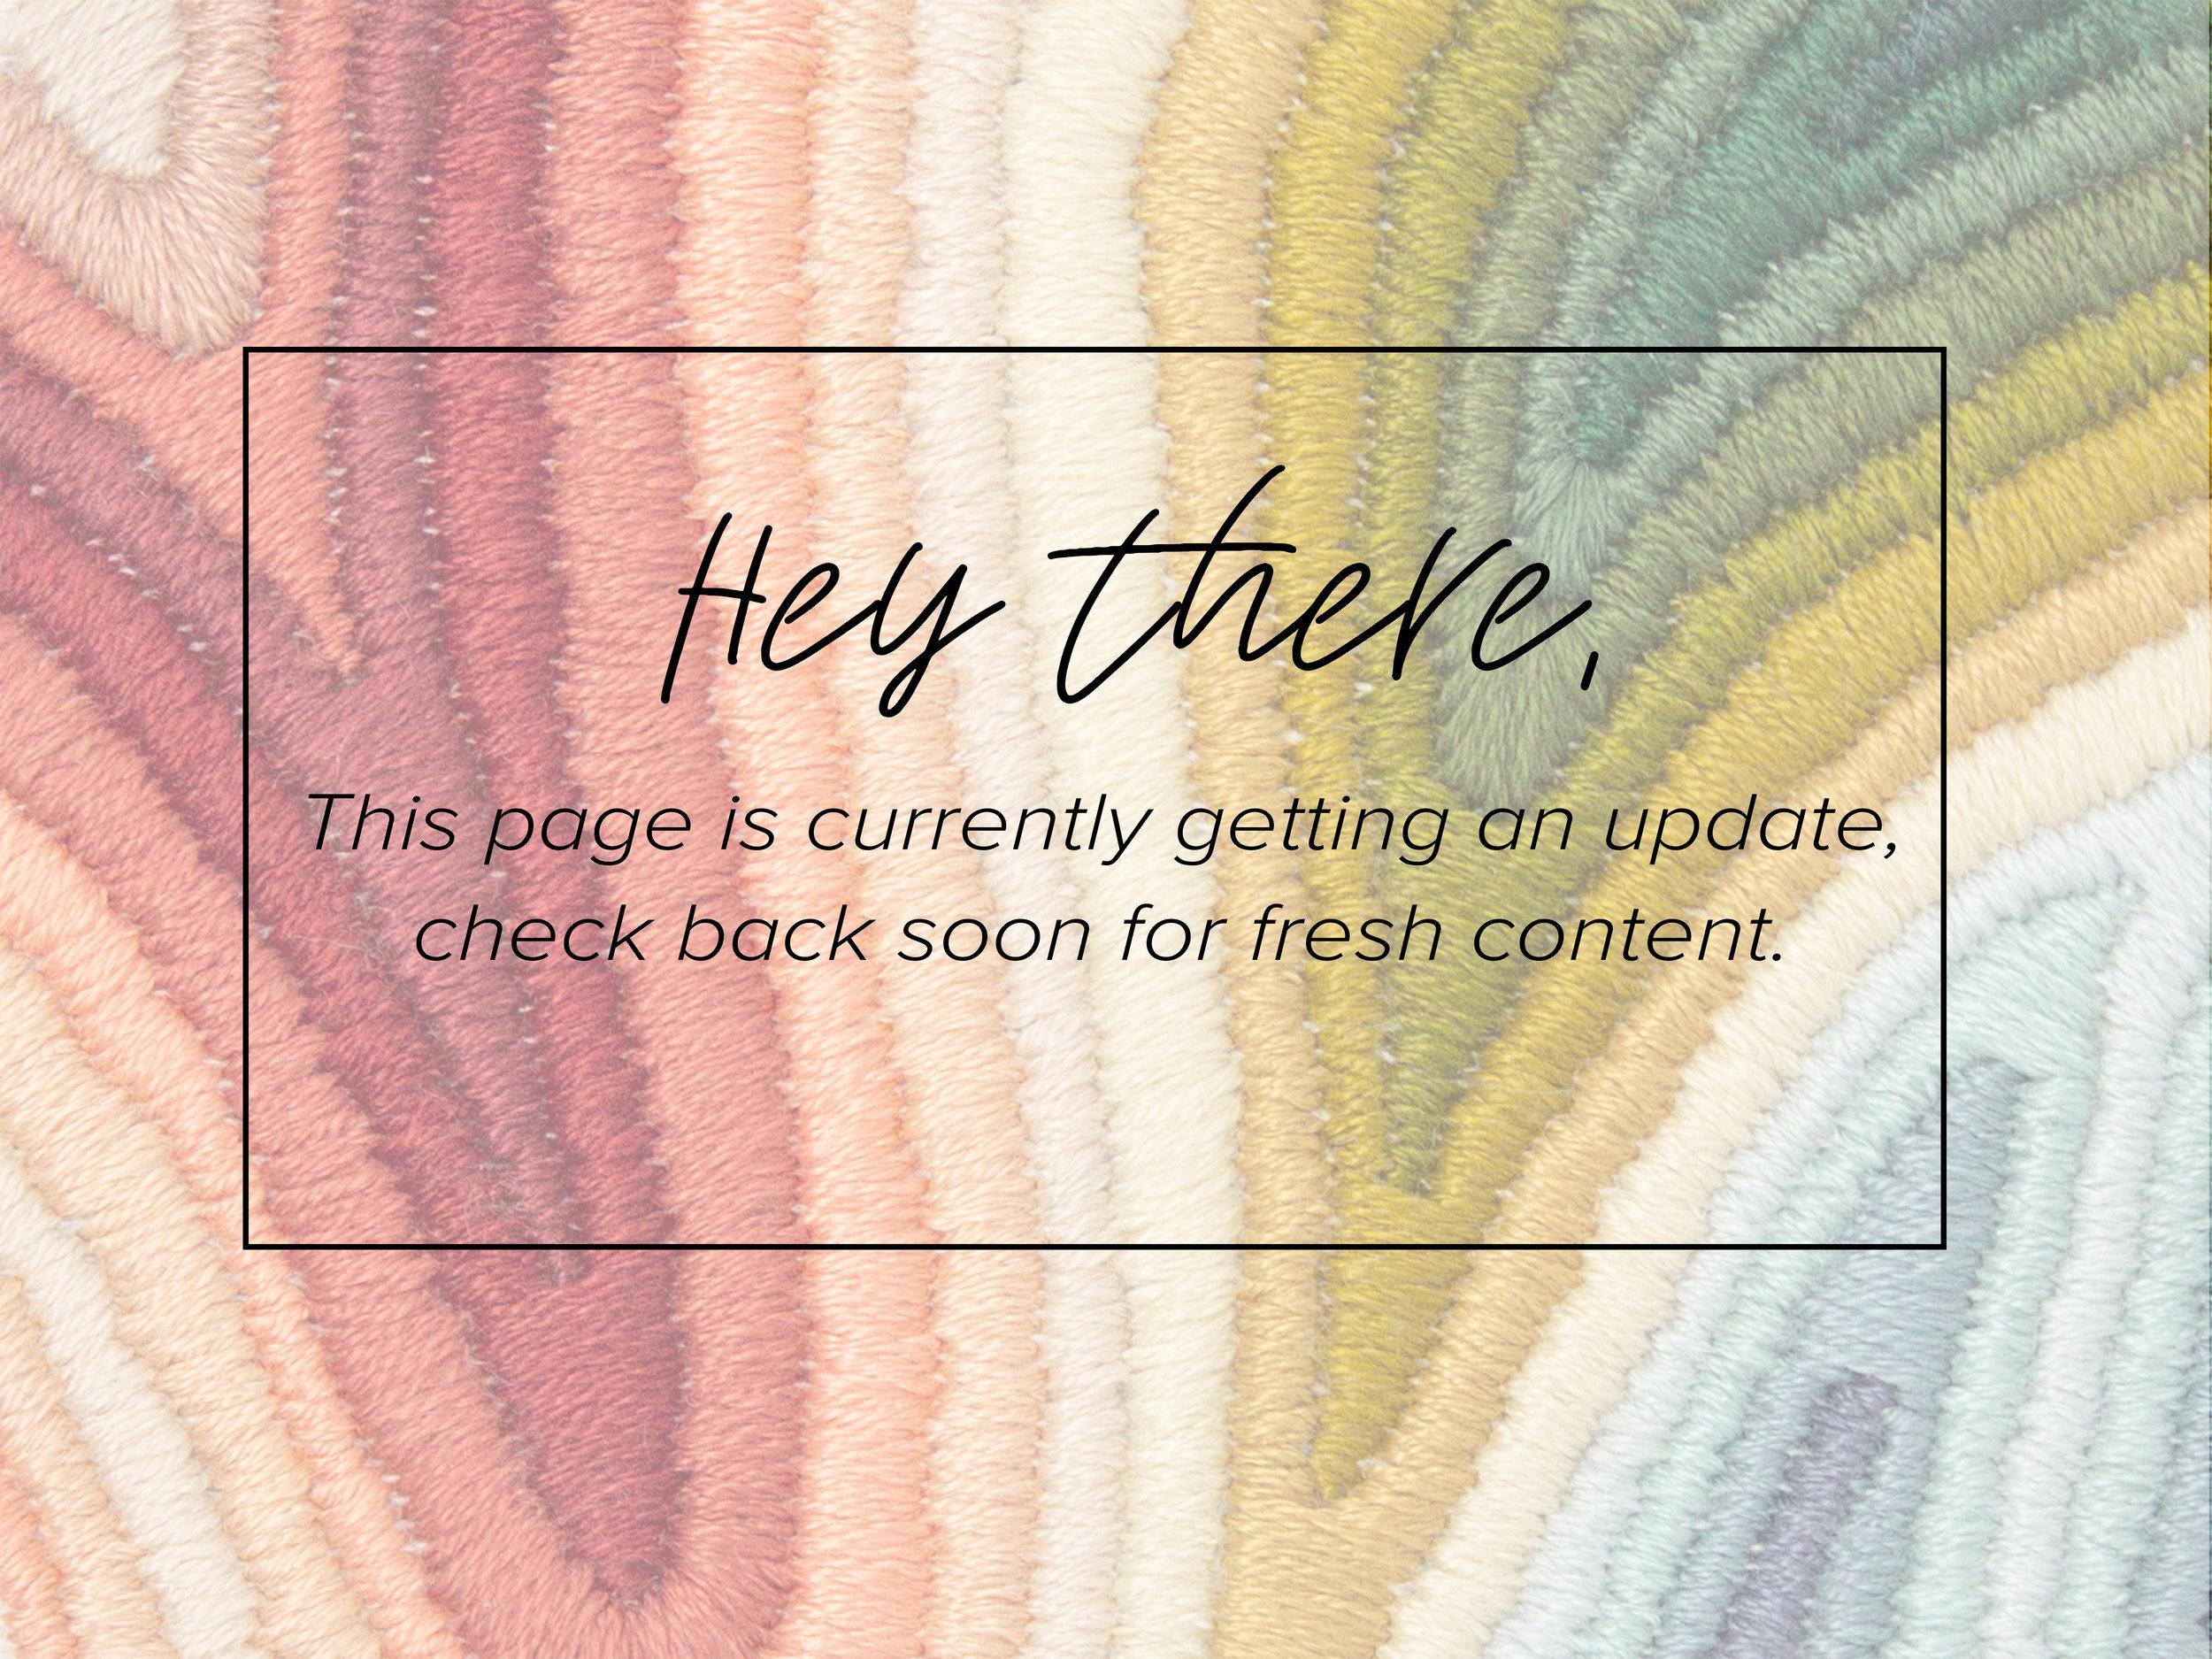 update notification.jpg